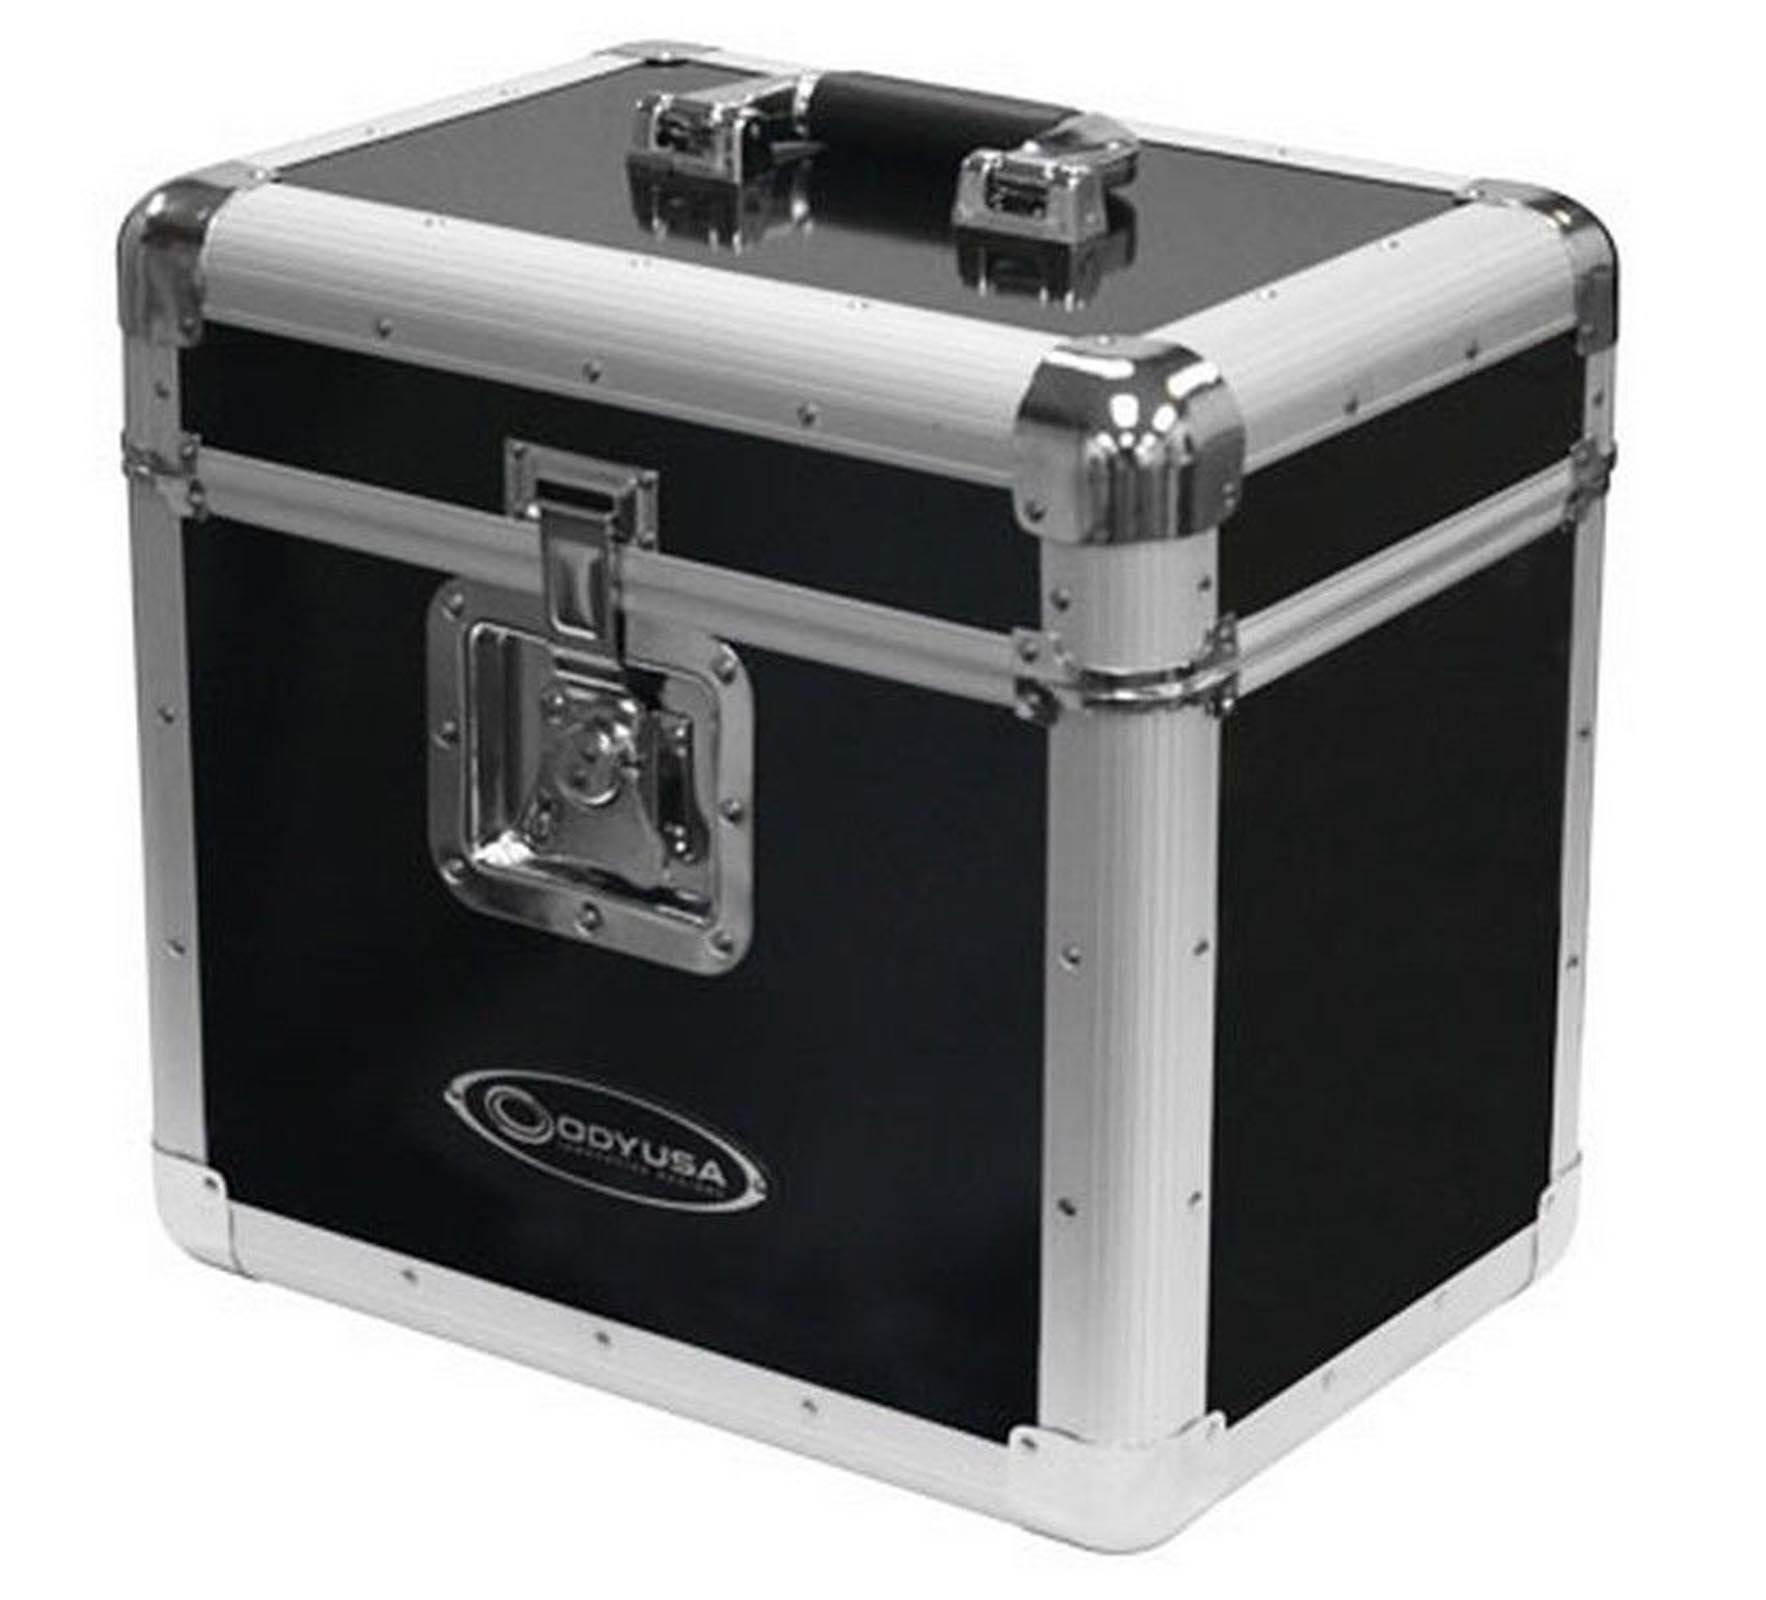 "New! Odyssey KLP1-BLACK KROM for 70 12"" LP Vinyl Records Utility Transport Case by Odyssey"